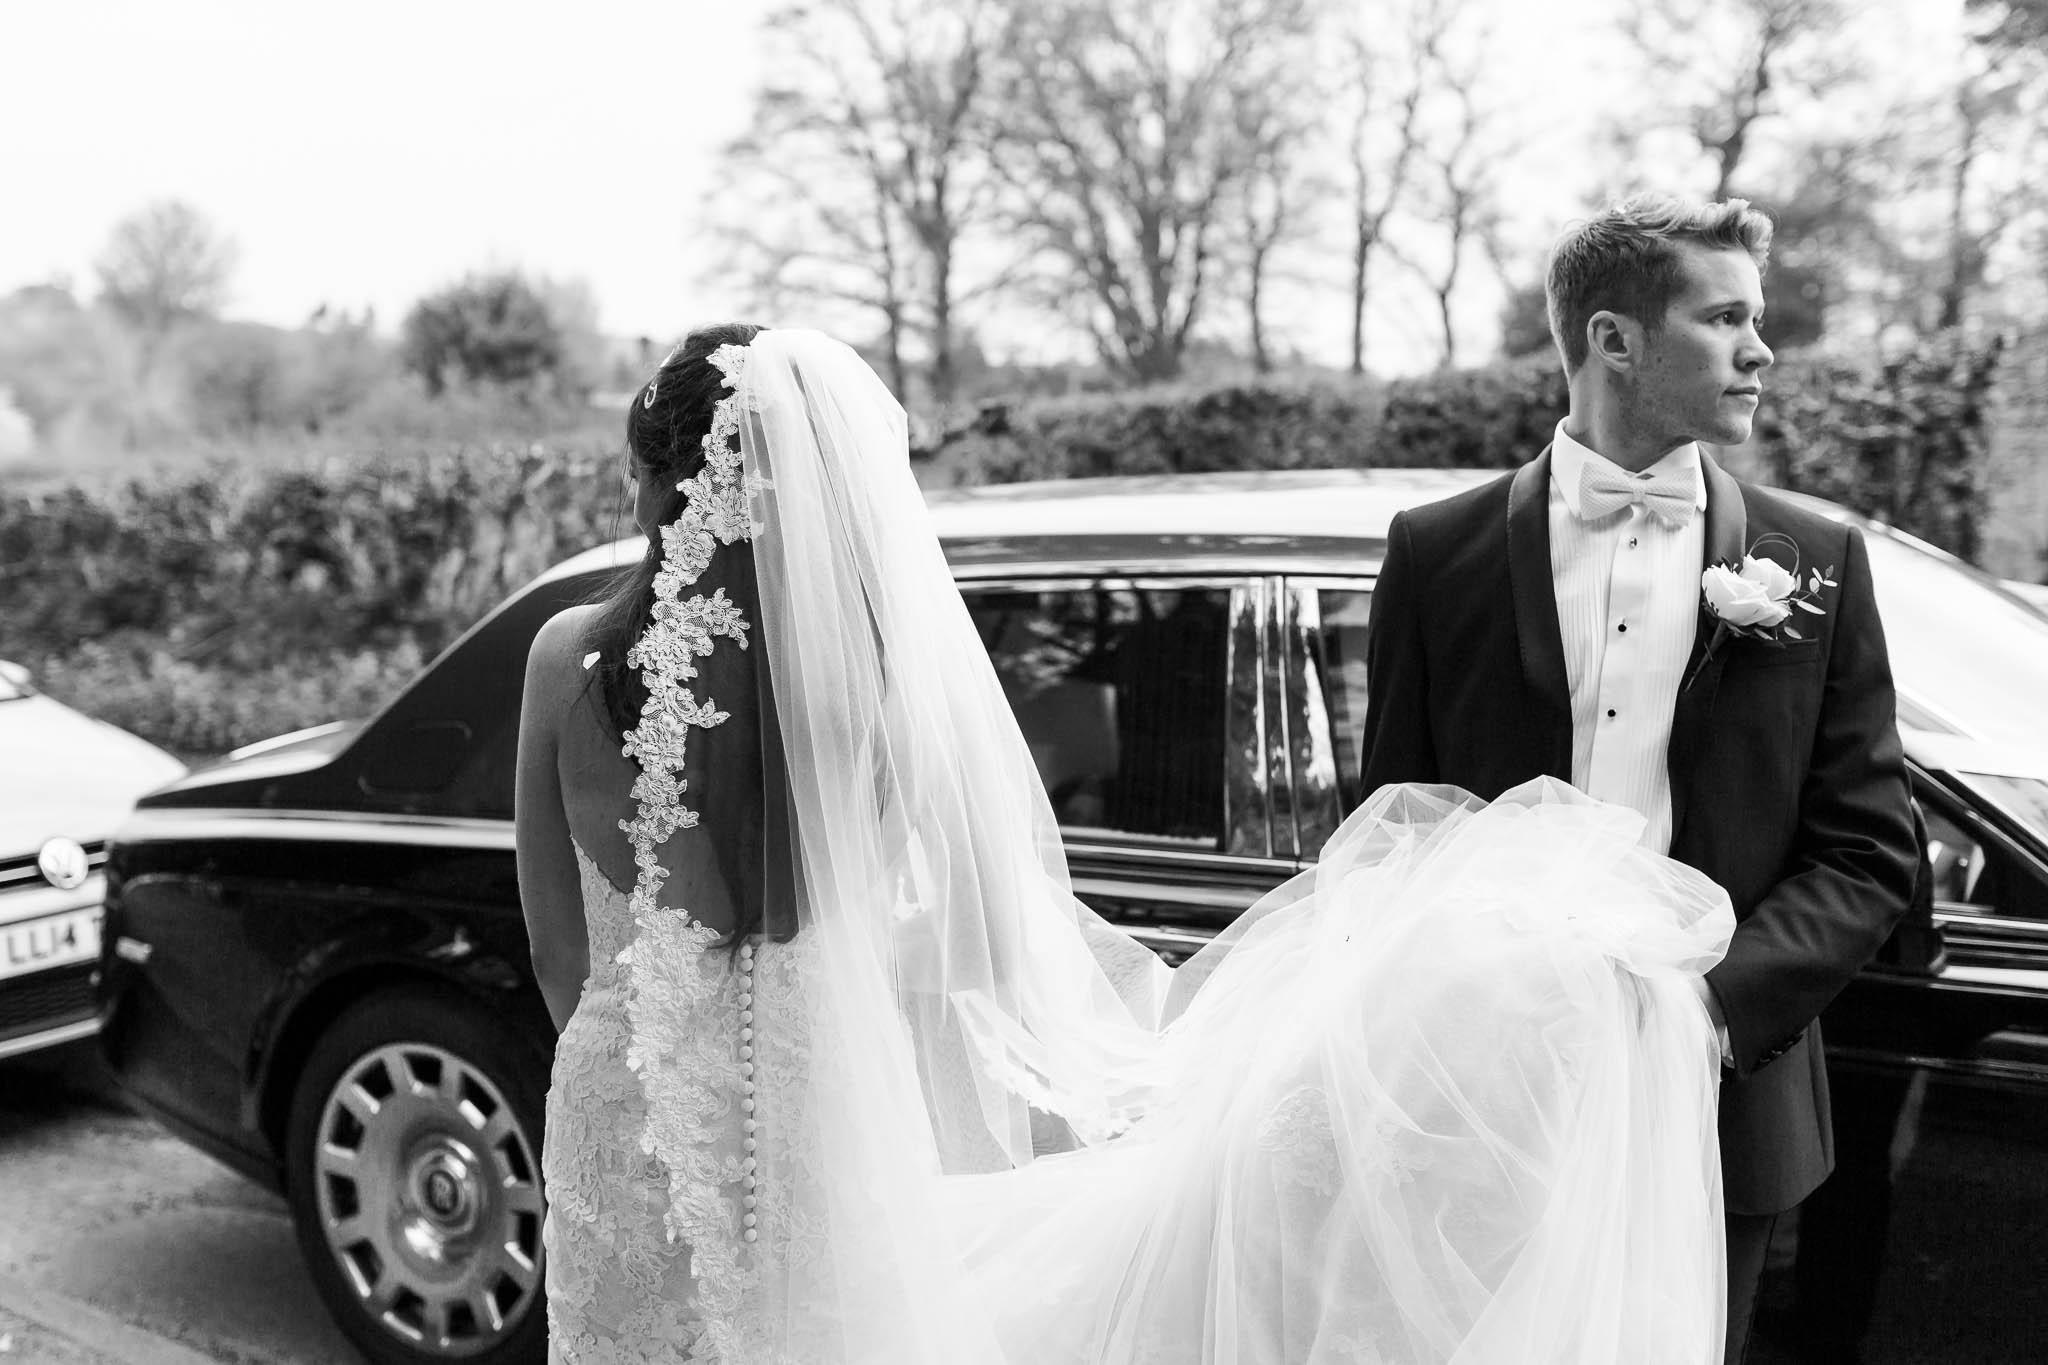 bride and groom getting in wedding car